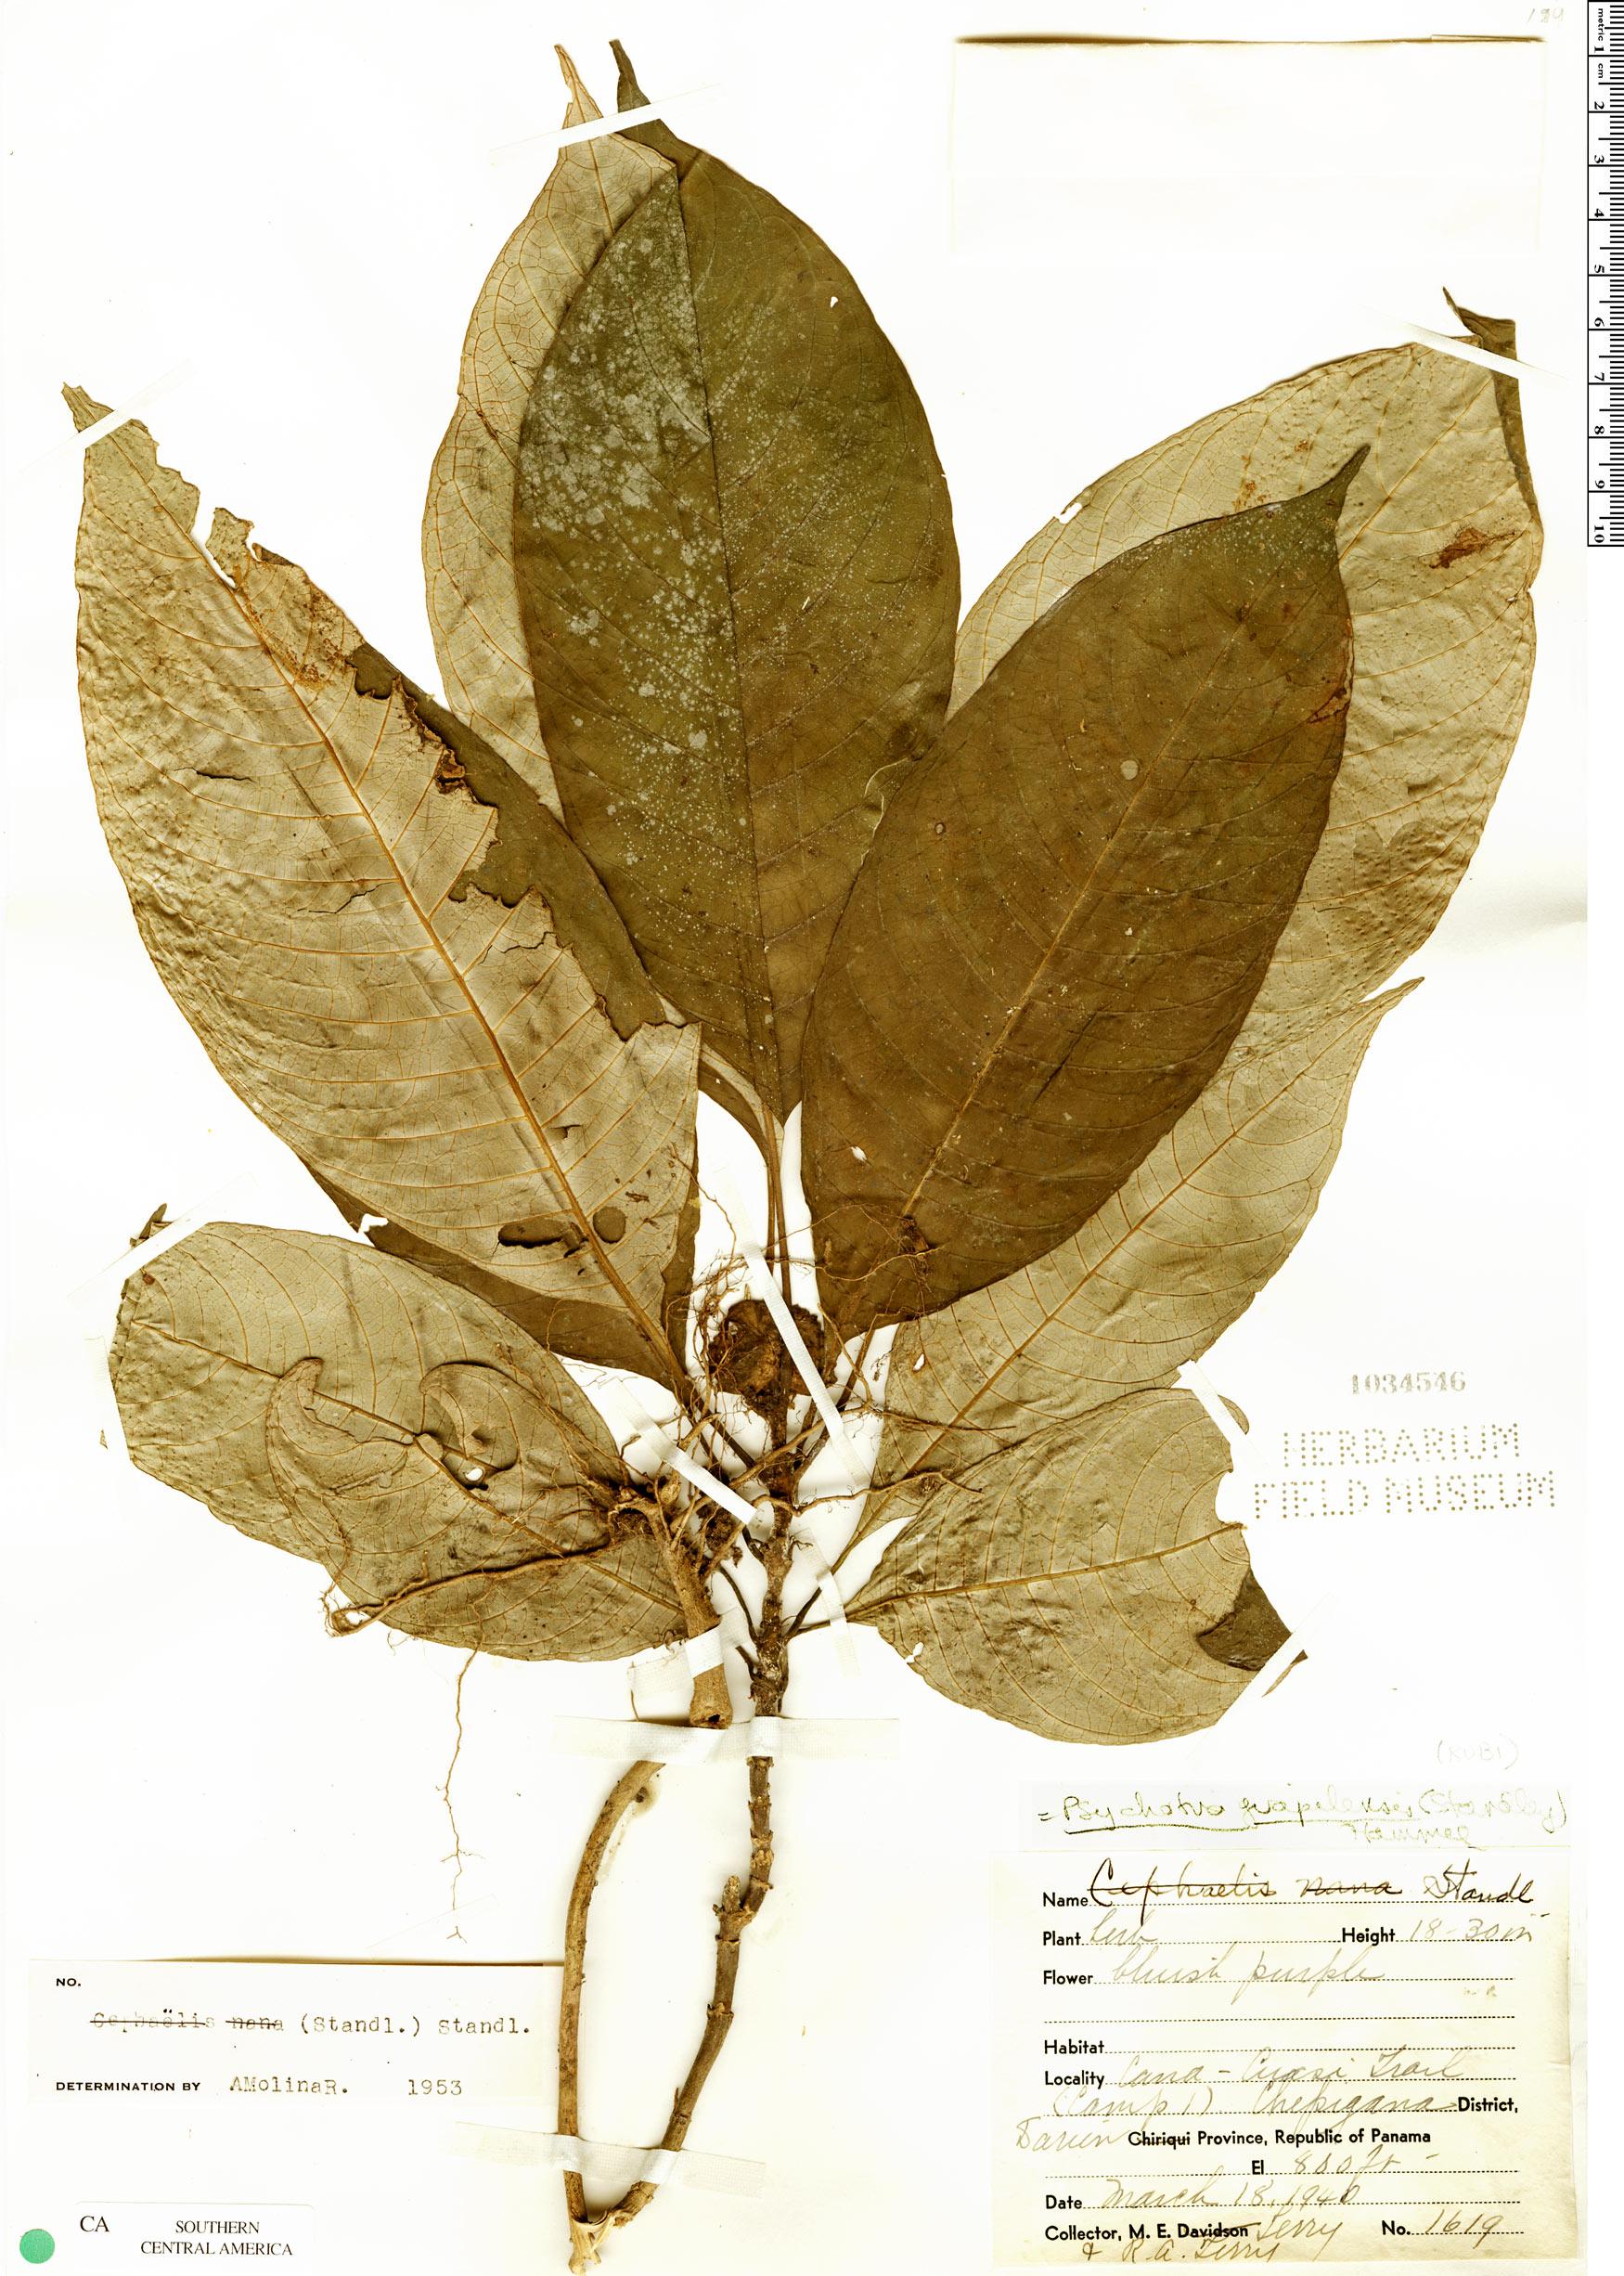 Specimen: Psychotria guapilensis